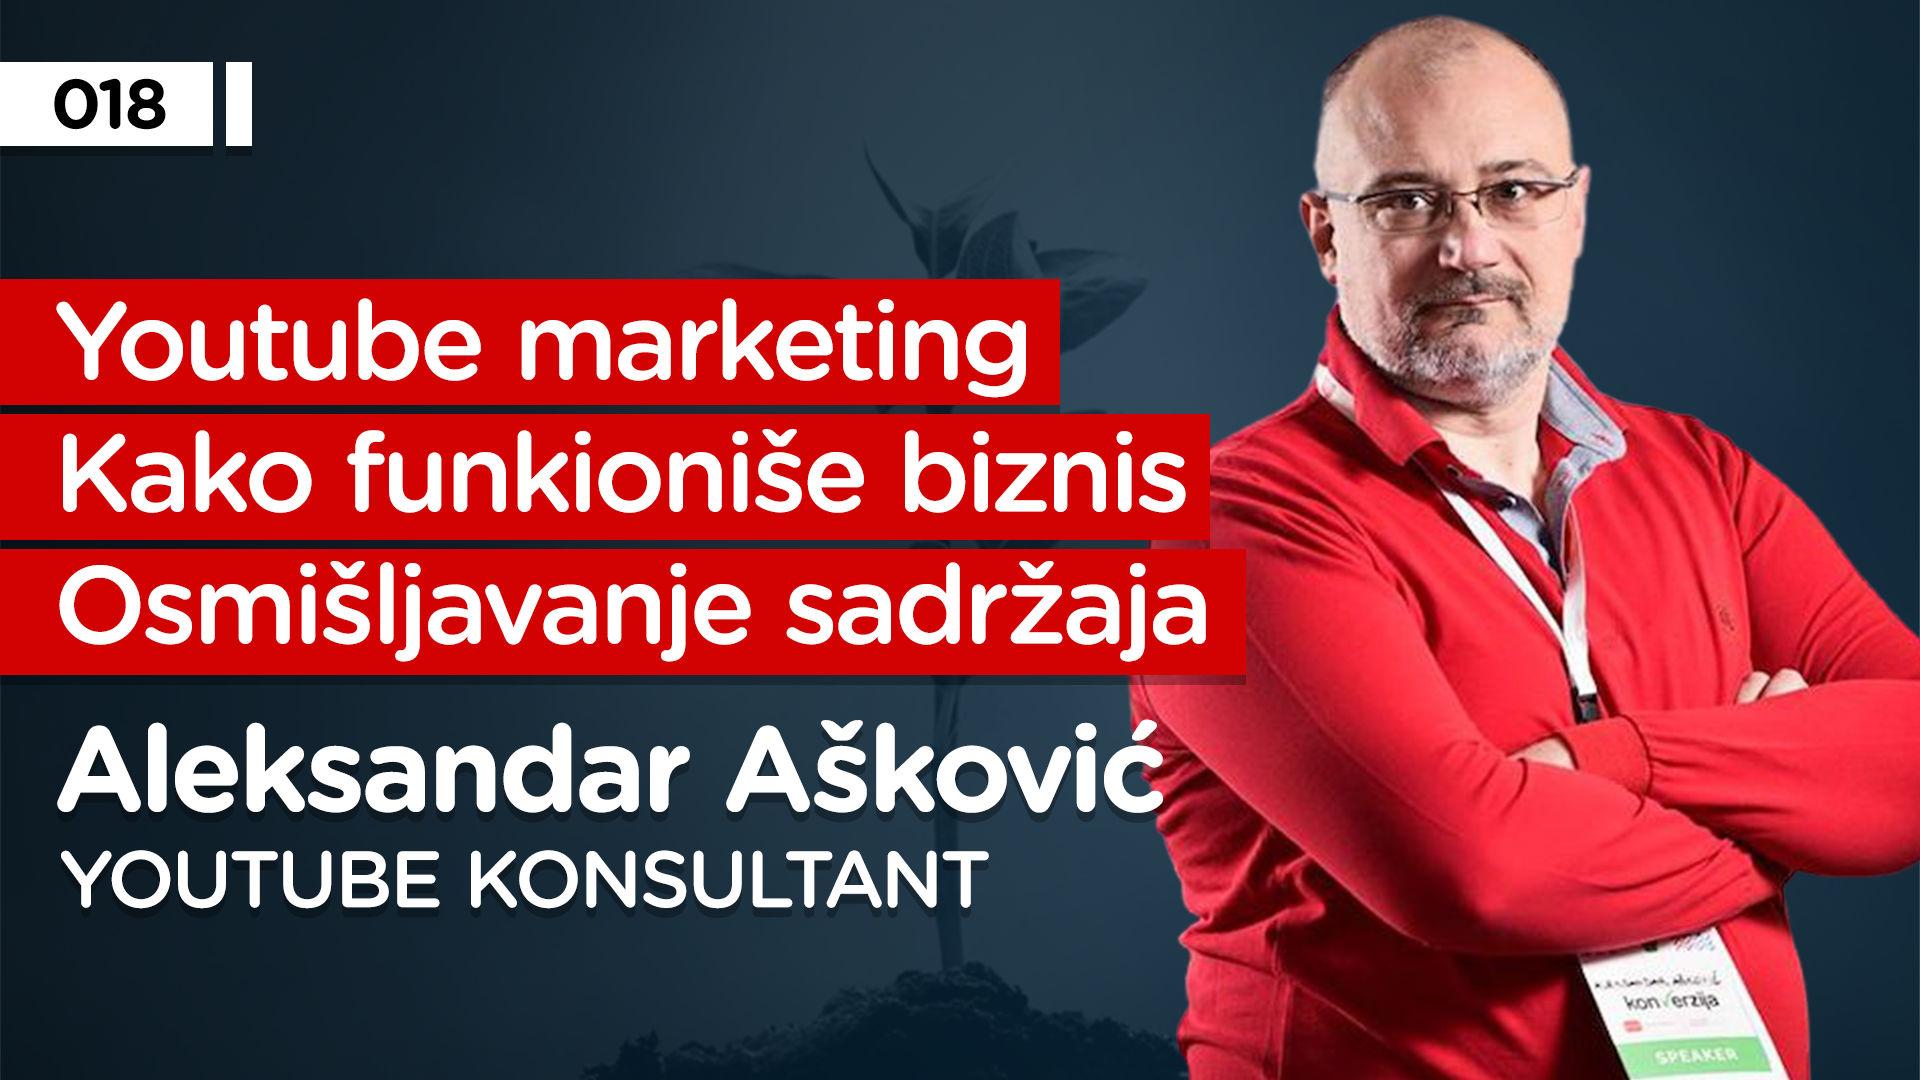 EP018: Aleksandar Ašković